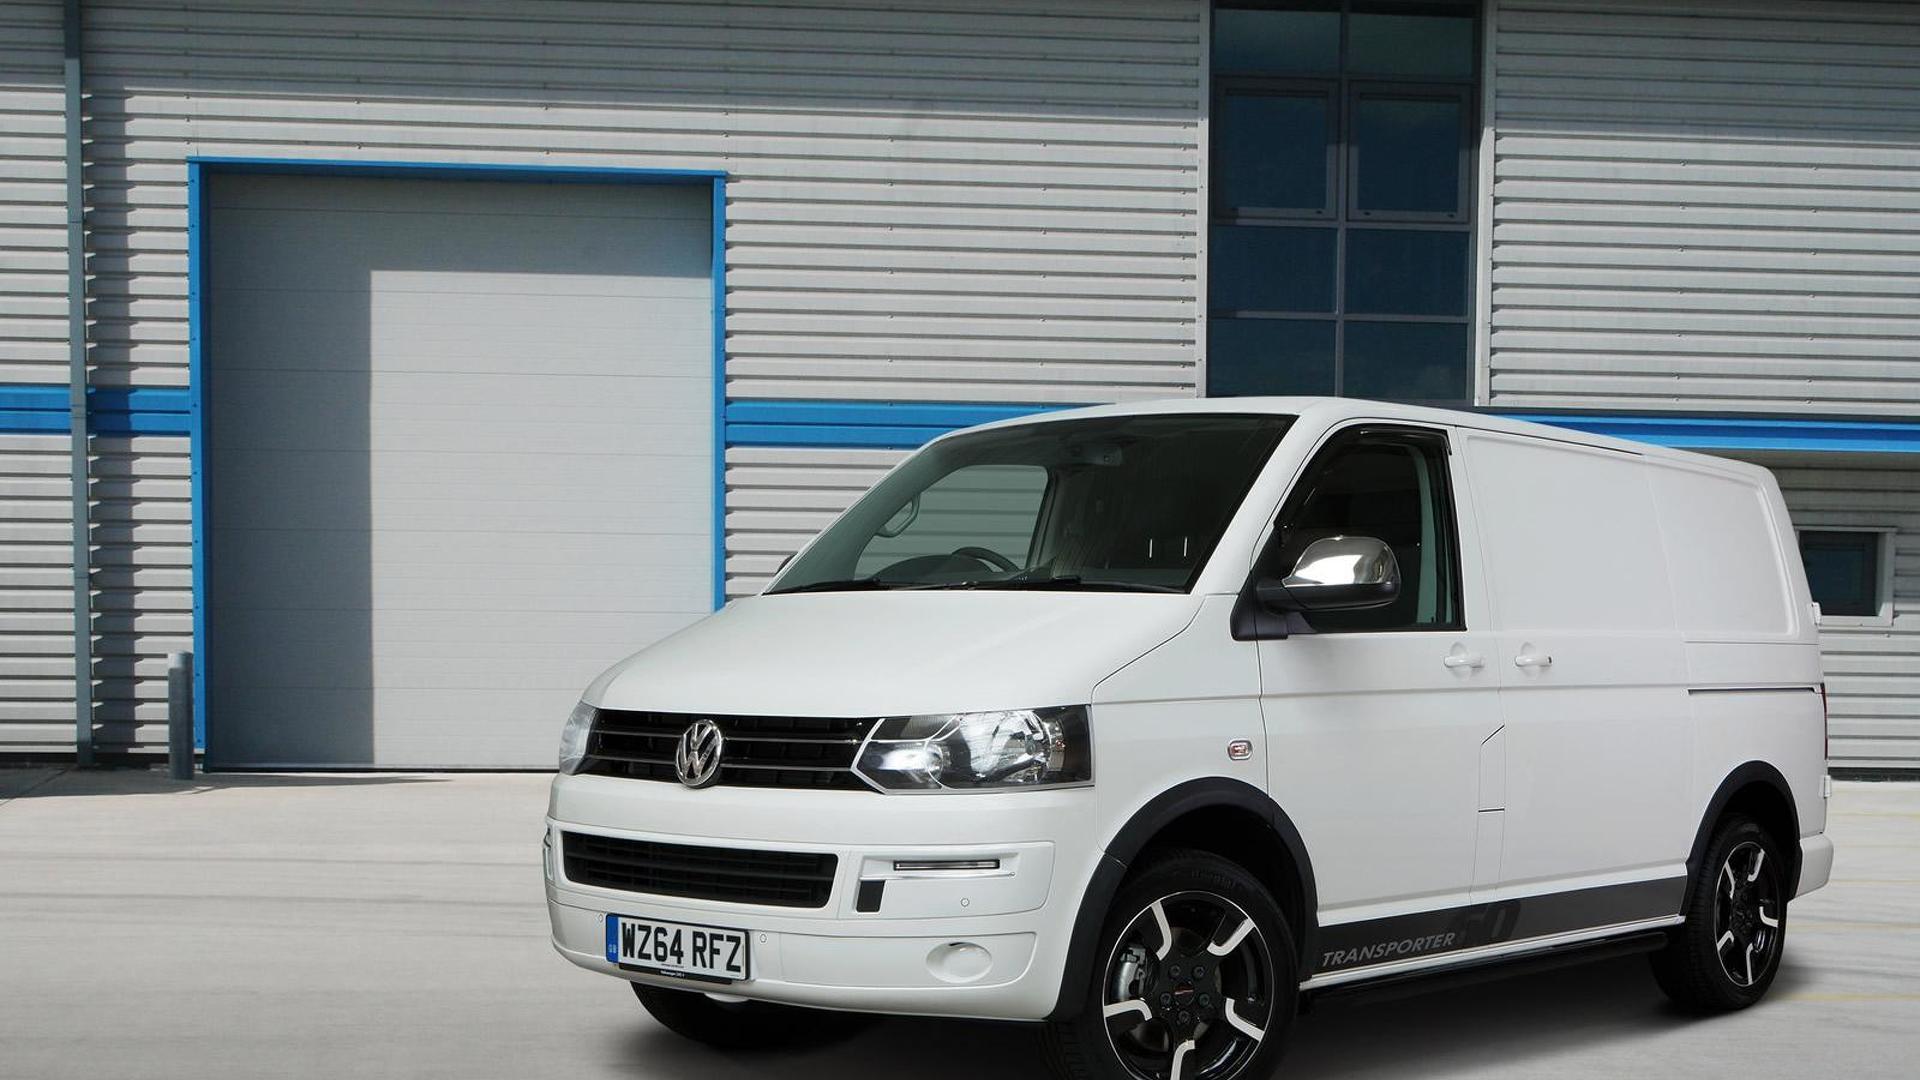 Volkswagen Transporter gains 60 Anniversary Pack in UK